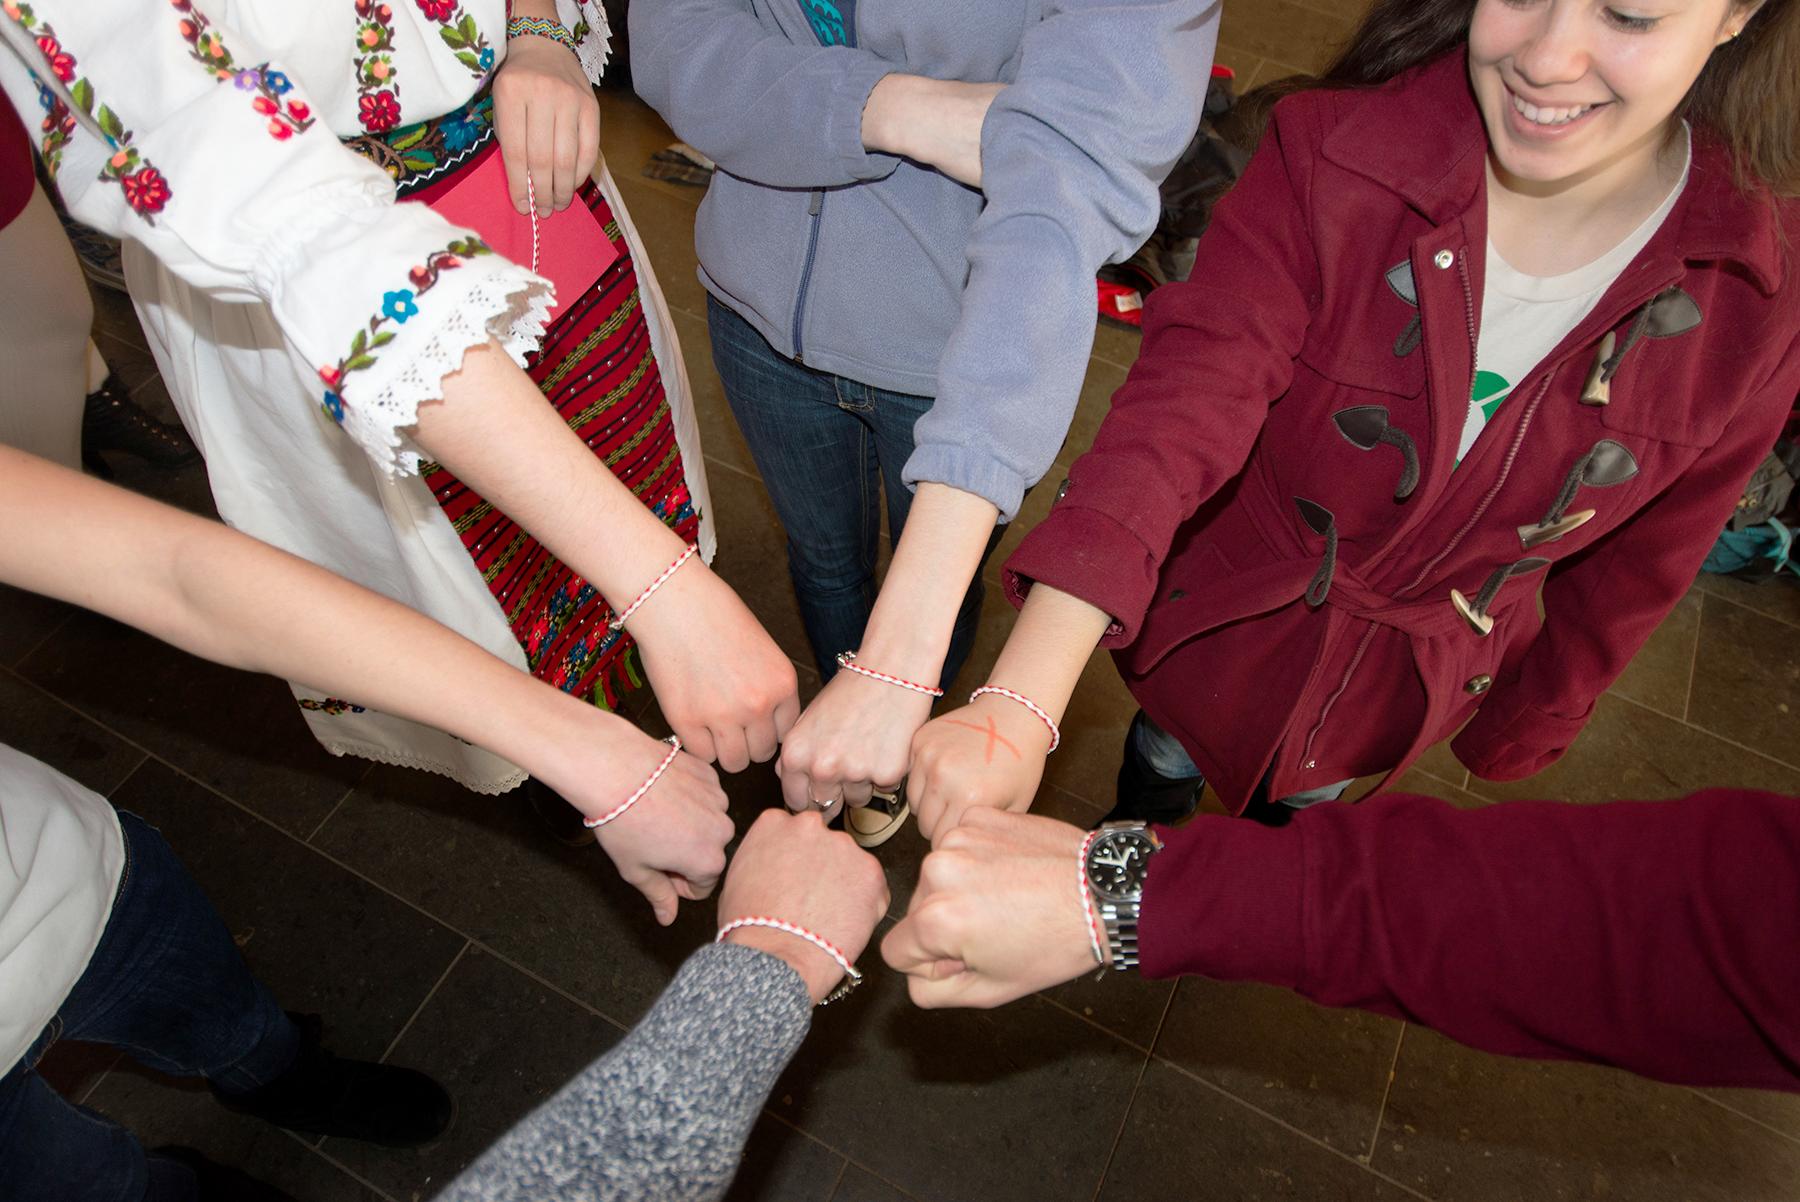 Wrists sporting the bracelets